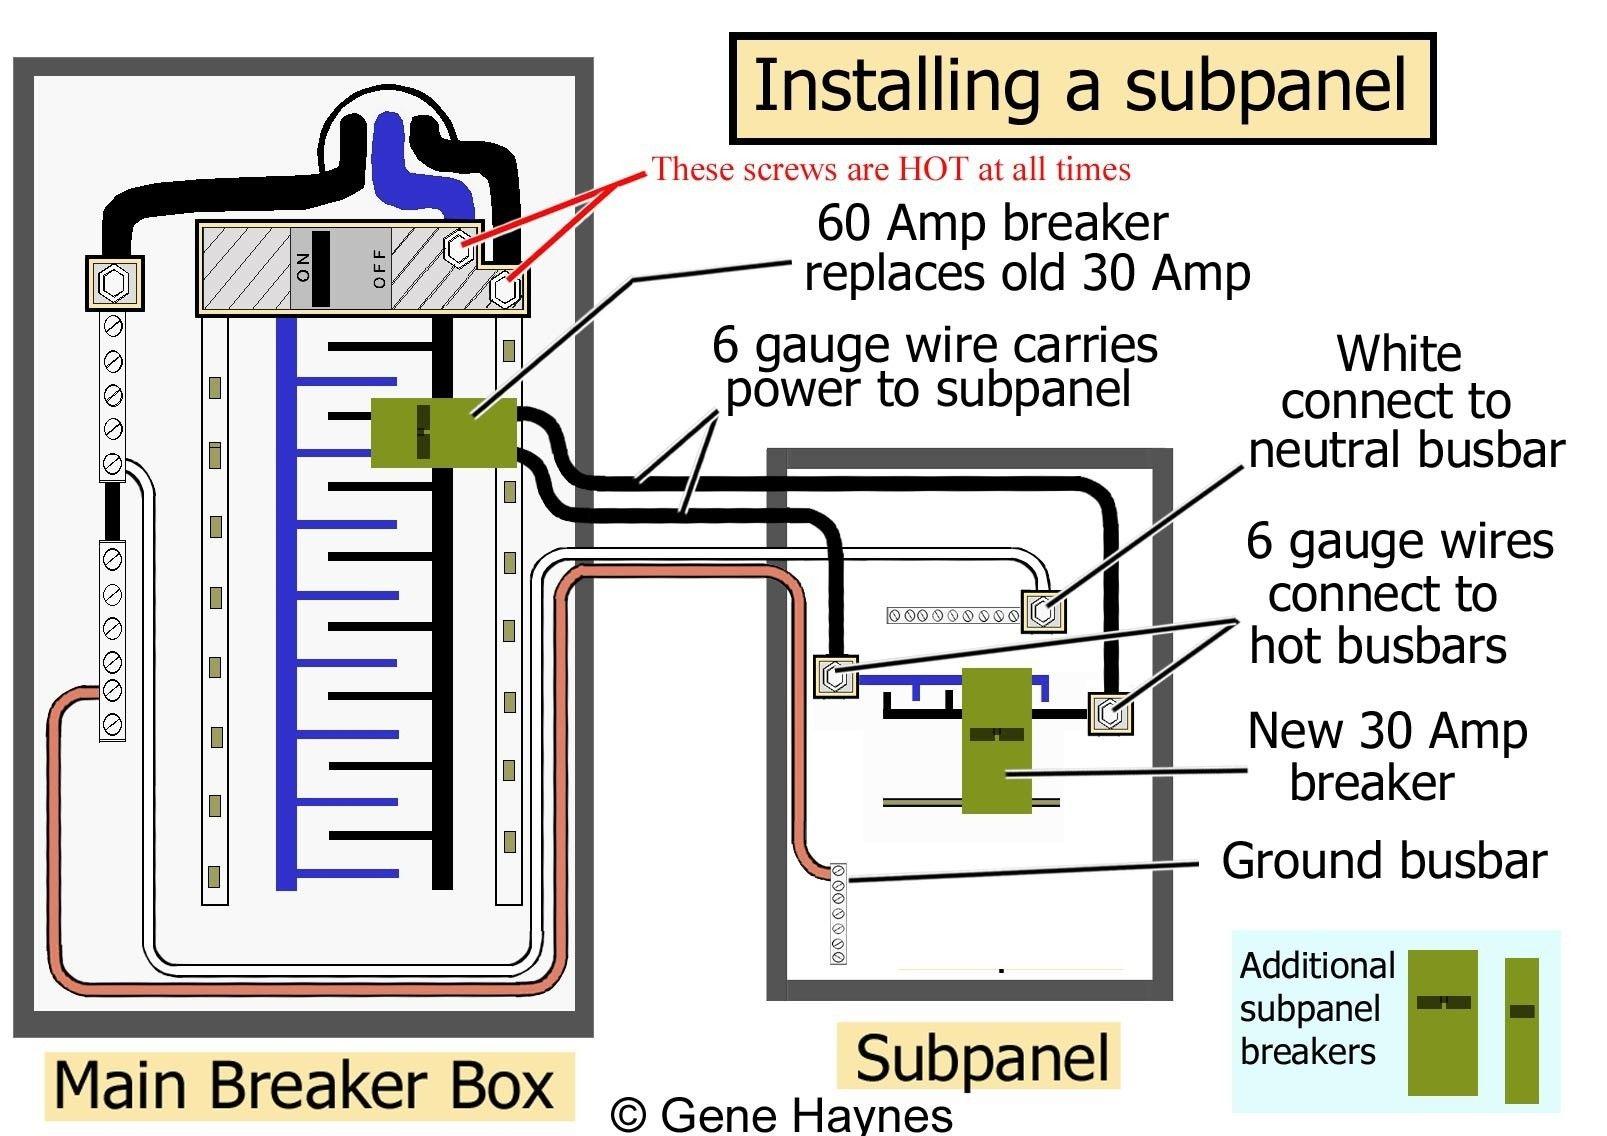 30 Amp Sub Panel Wiring Diagram Inspirational Electrical Panel Wiring Home Electrical Wiring Electrical Panel